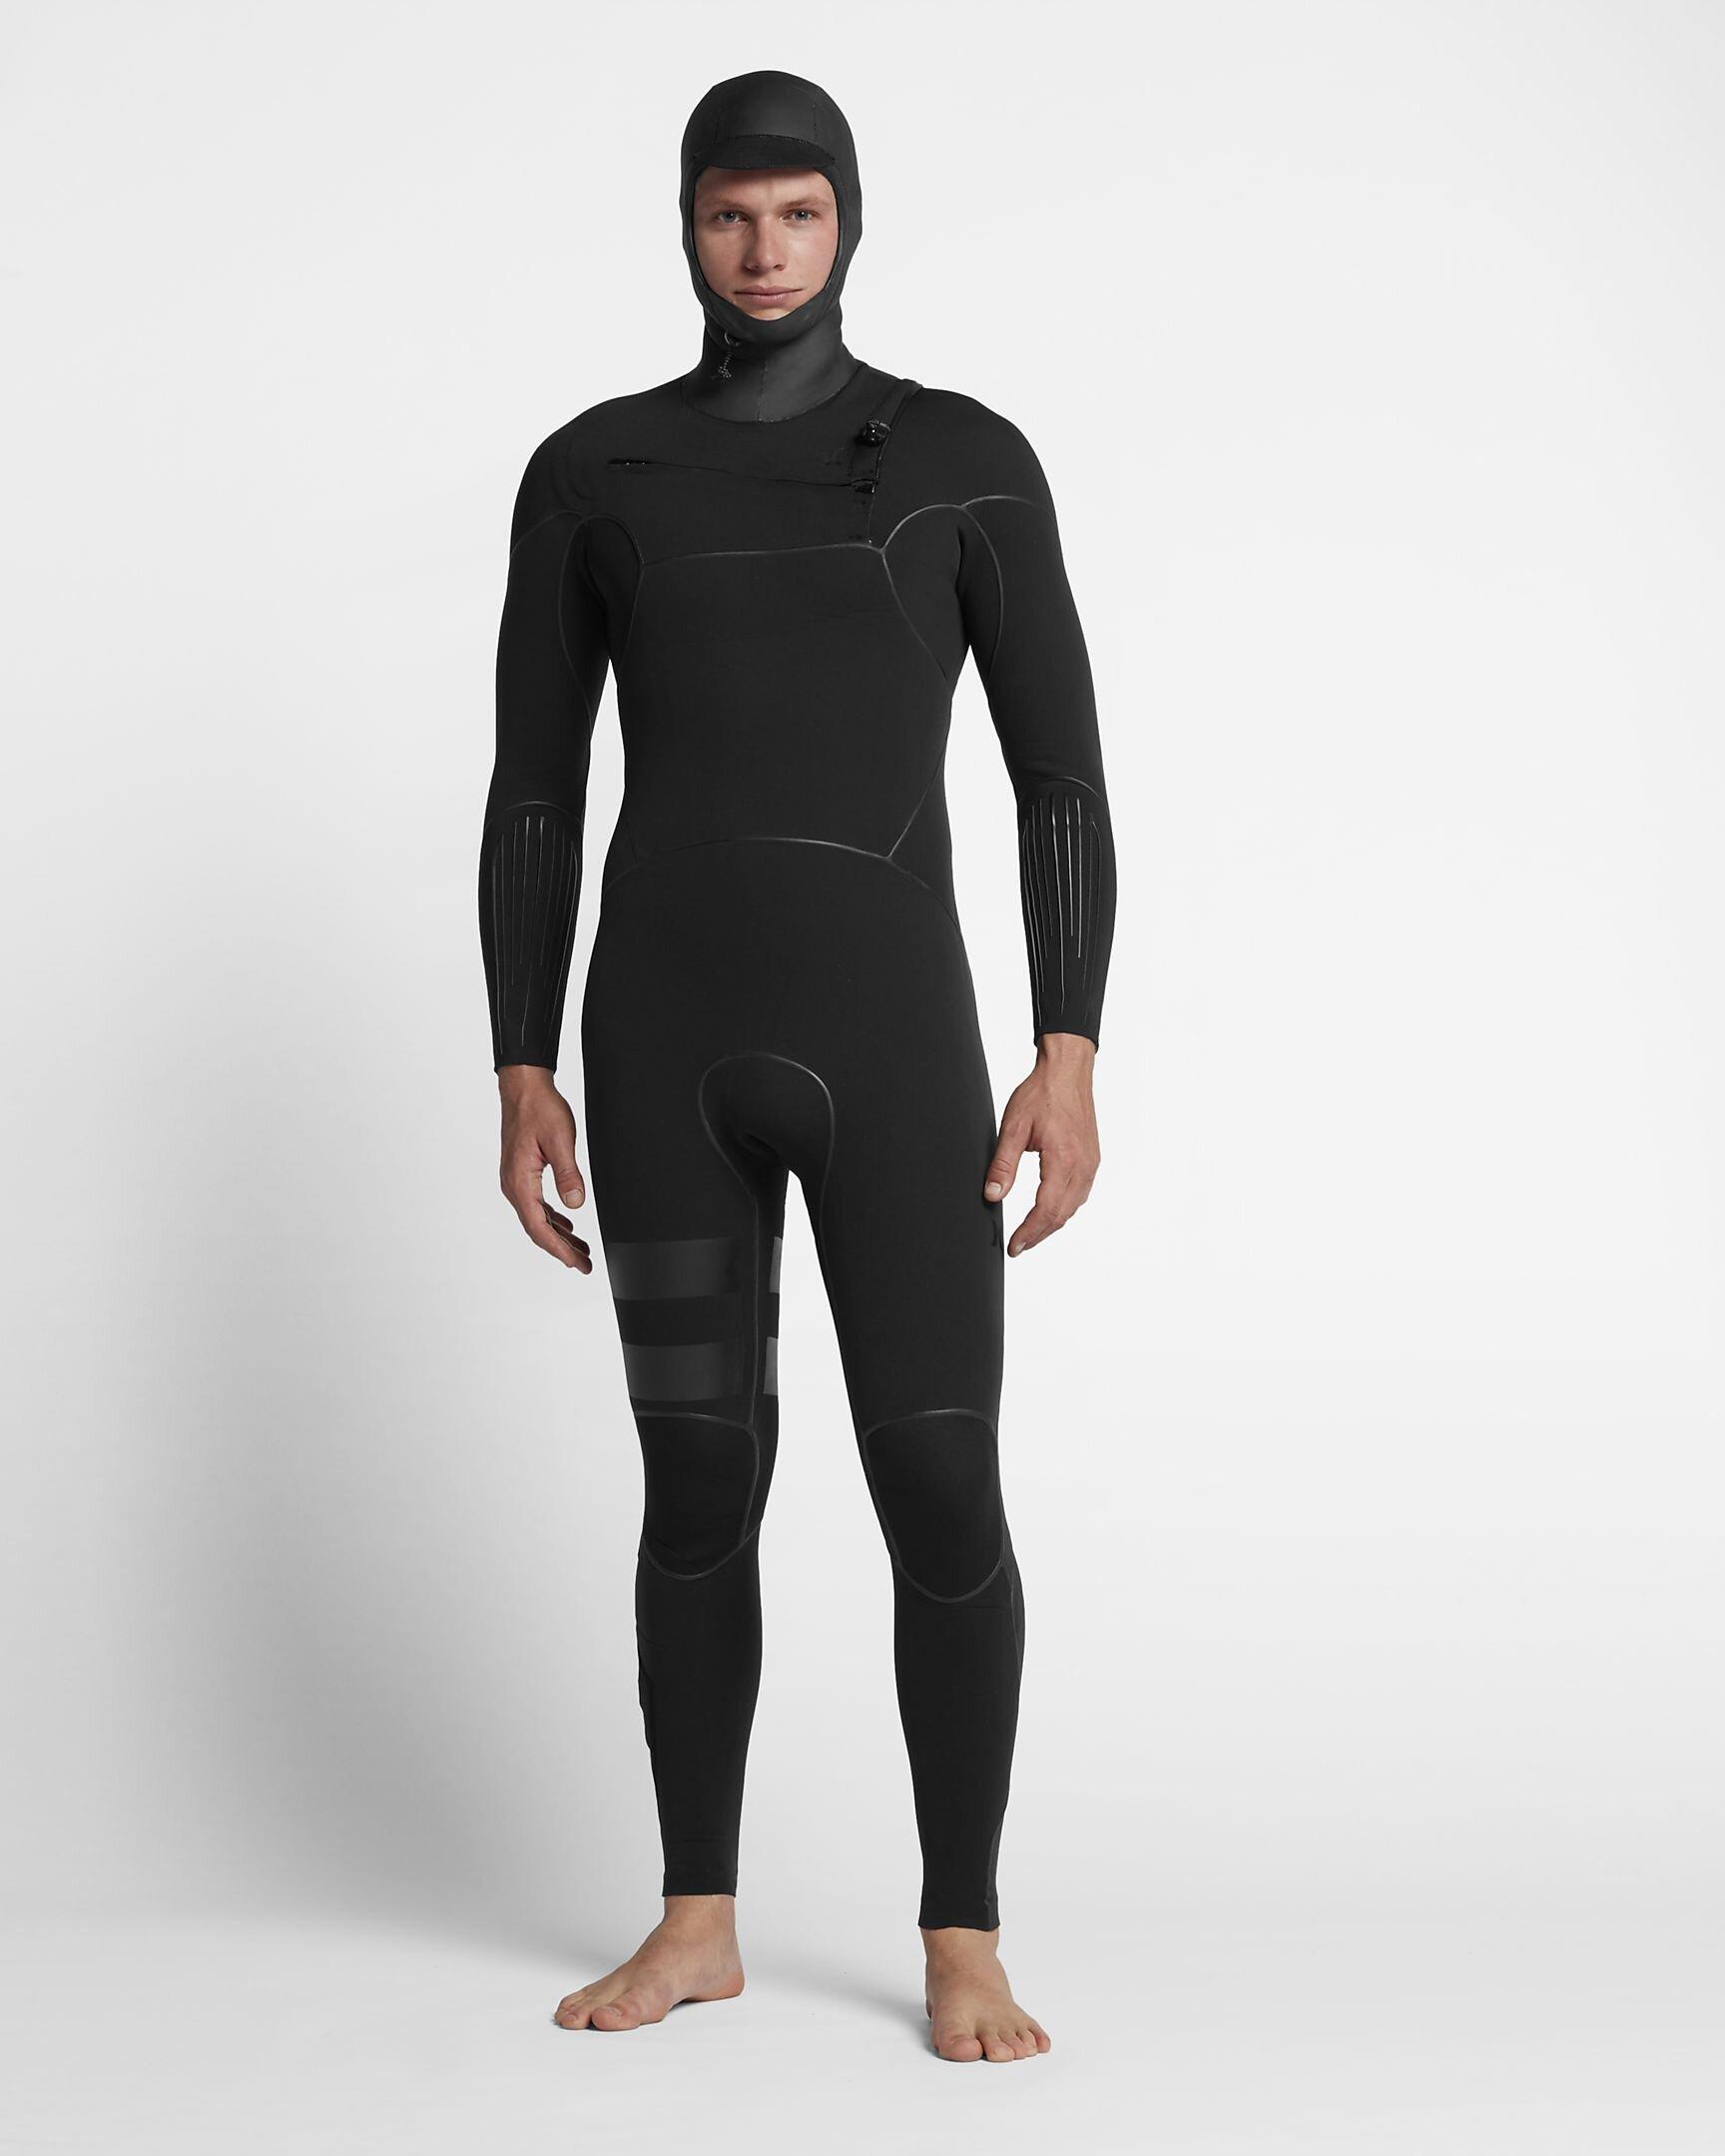 hurley-advantage-max-5-3mm-fullsuit-mens-wetsuit-e0pBAn.jpg